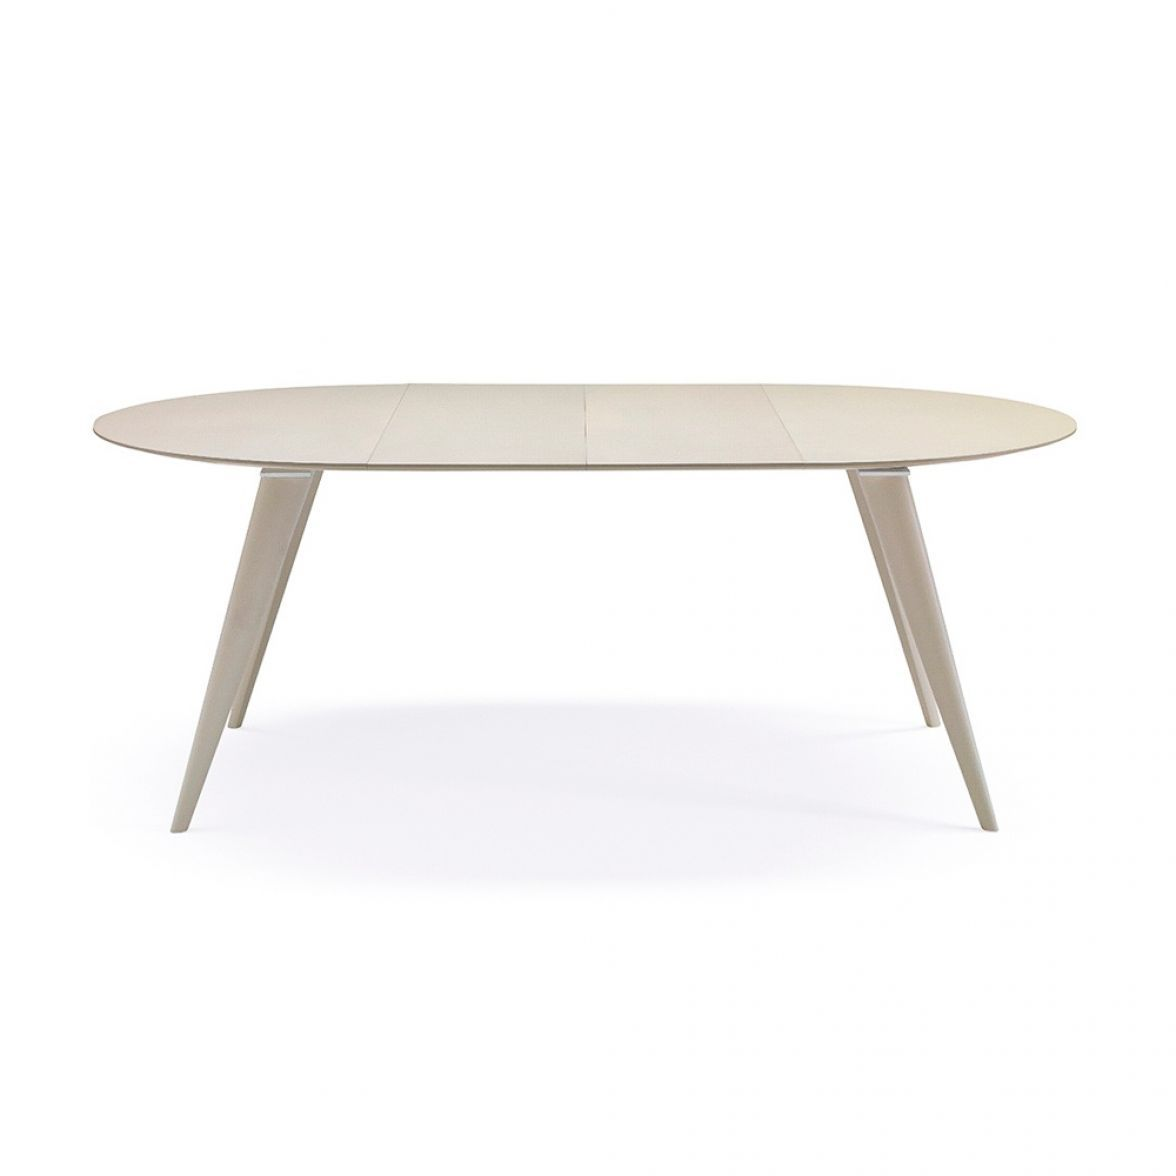 Elegance dining table  фото цена